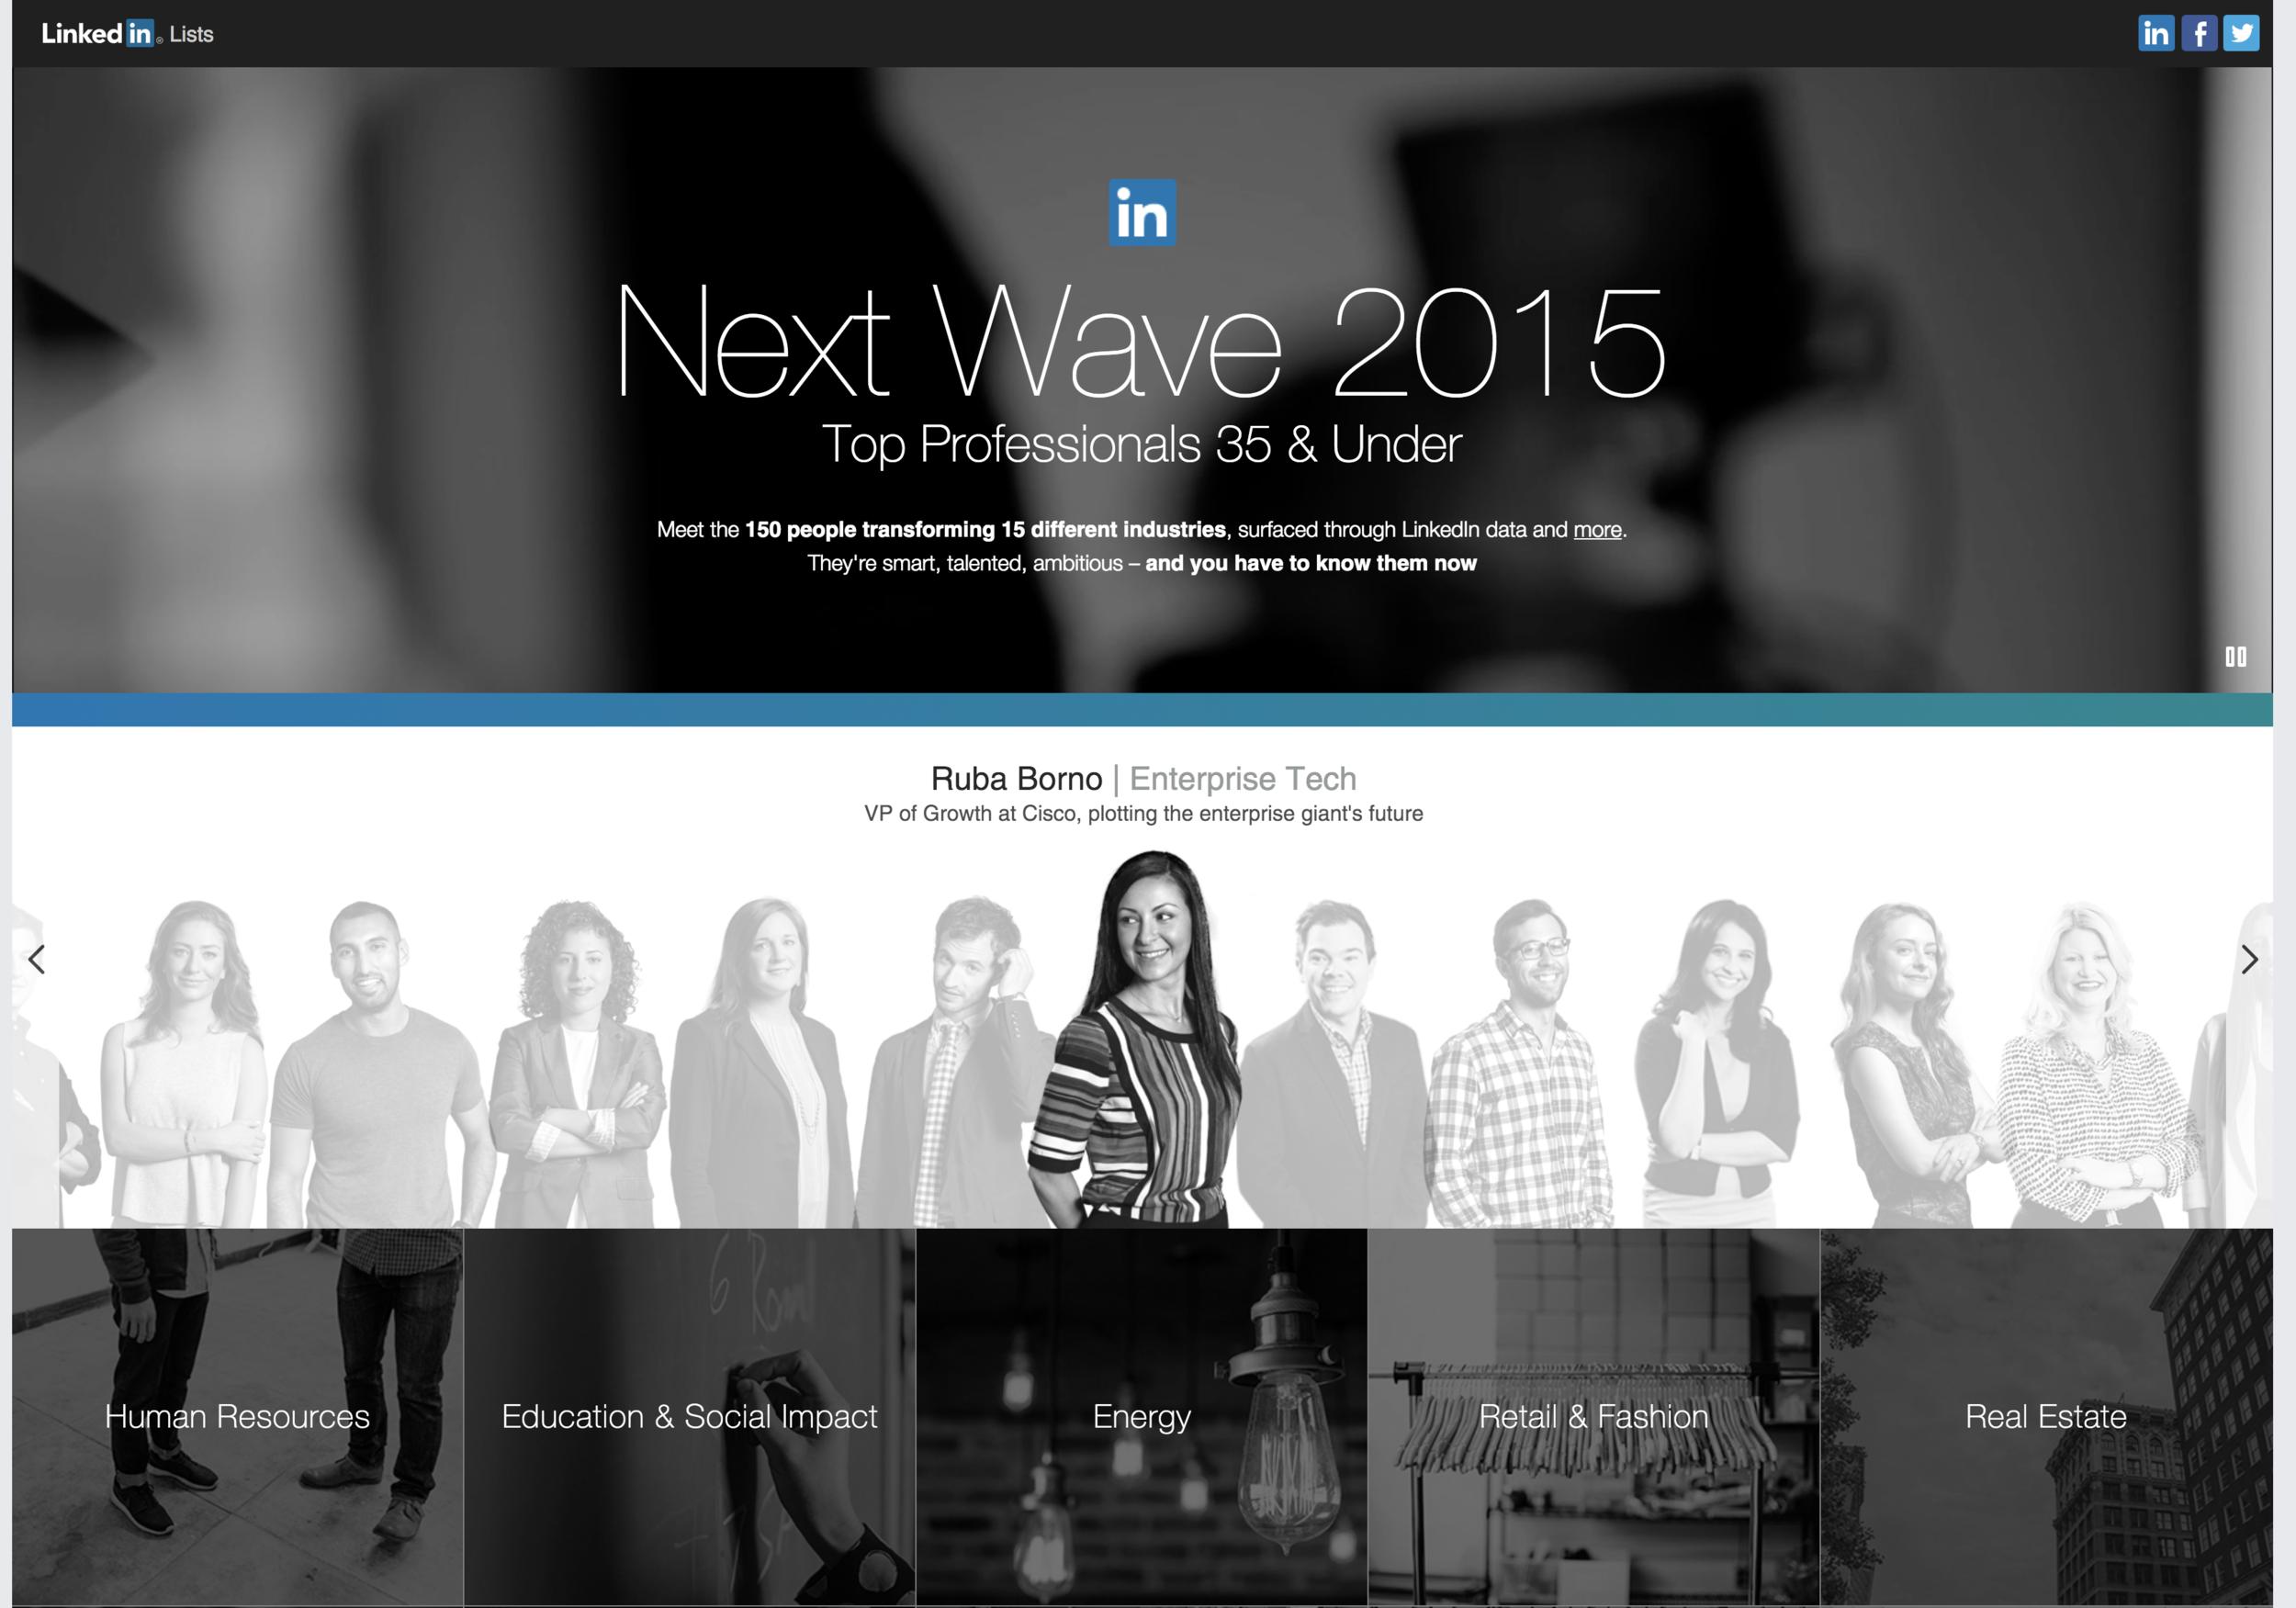 LinkedIn Next Wave 2015 List